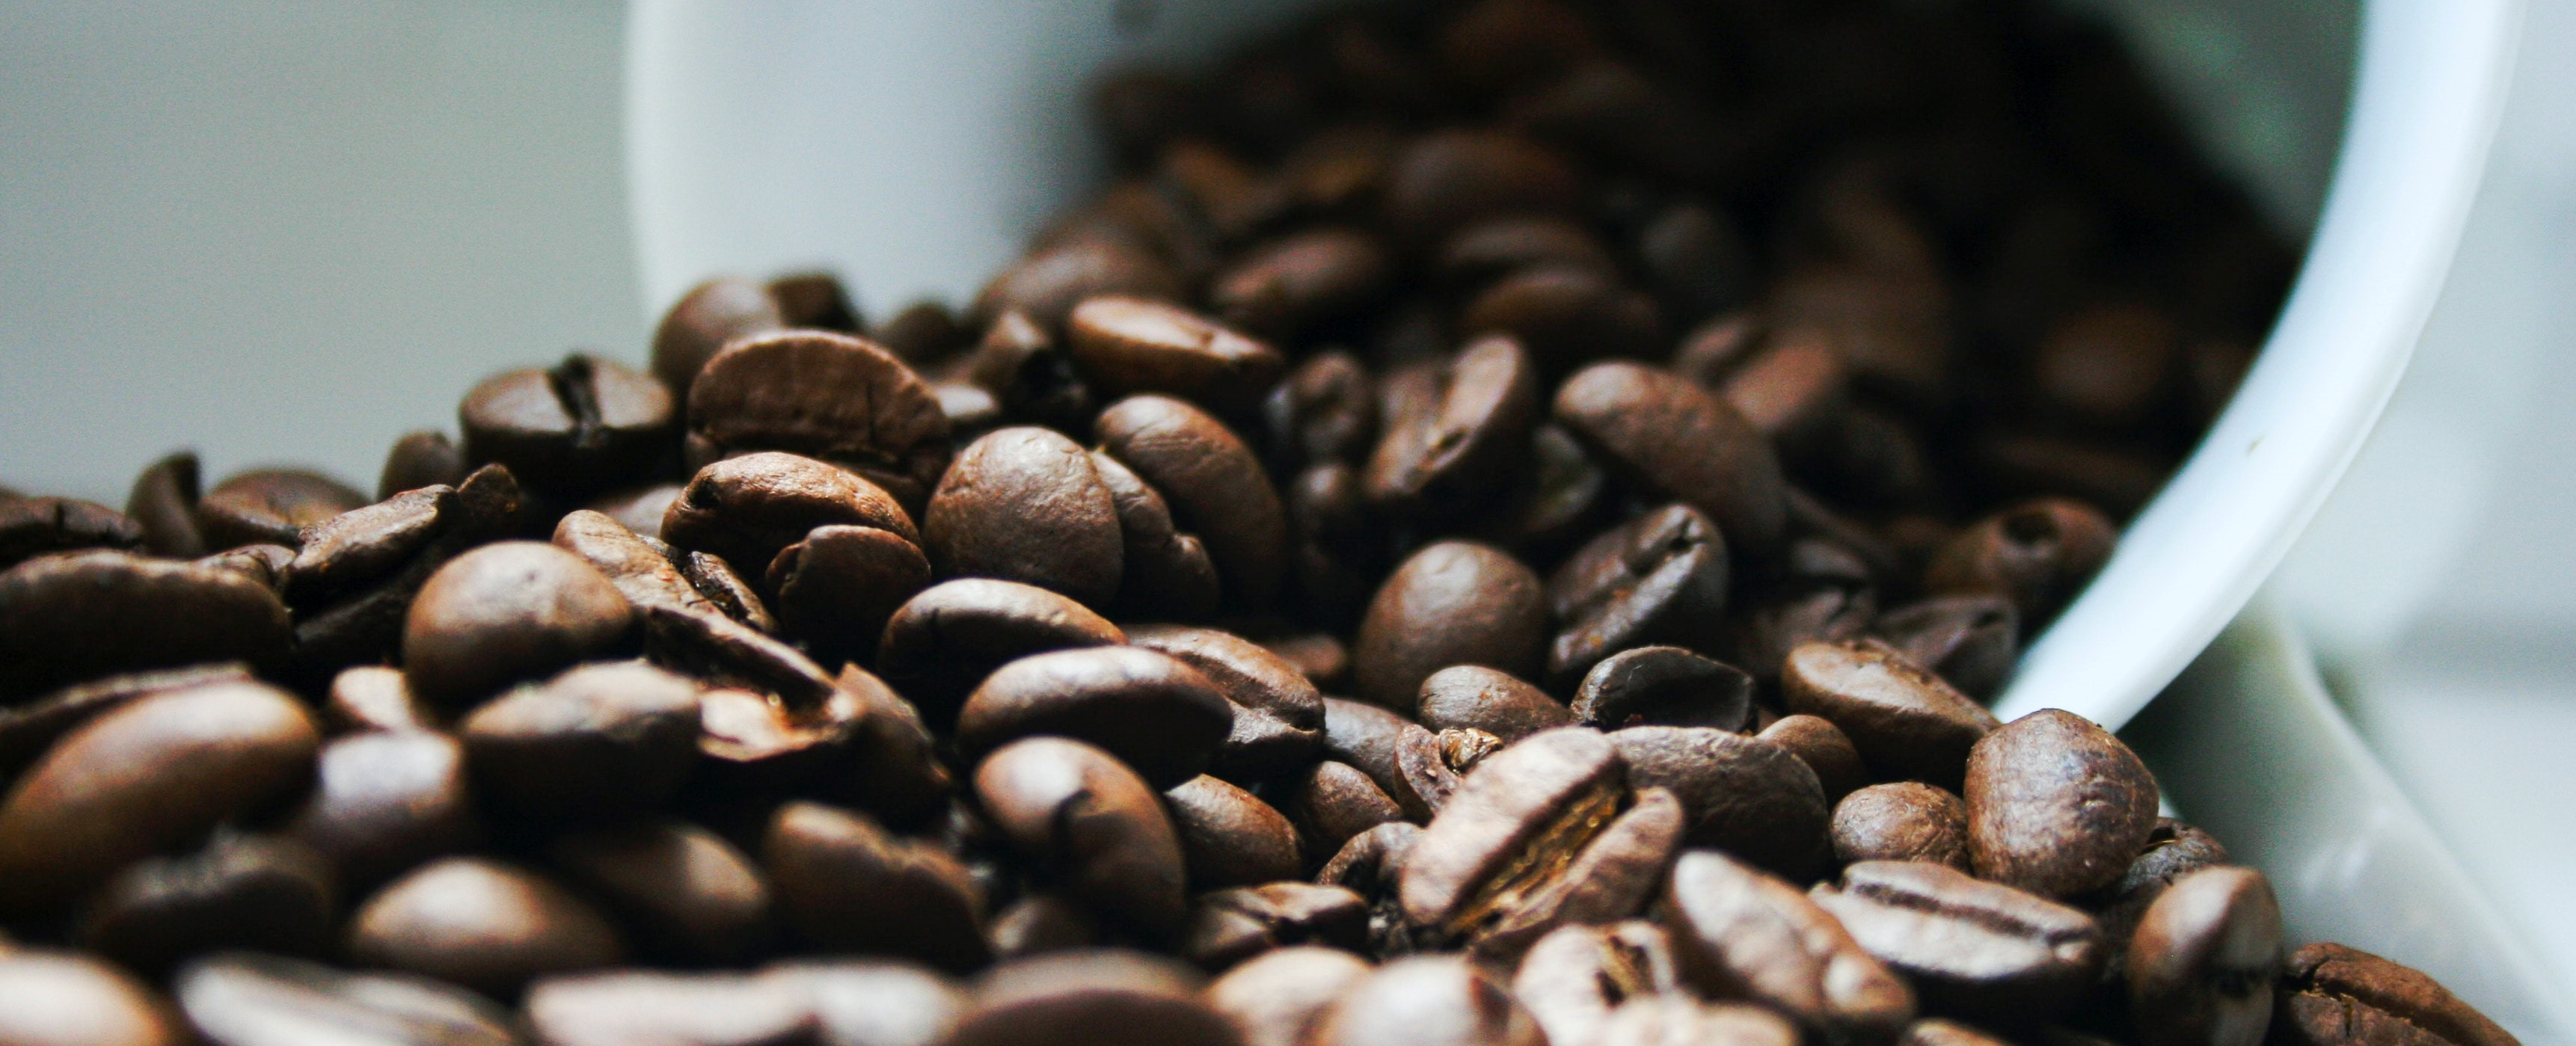 coffee beans_jolt-2